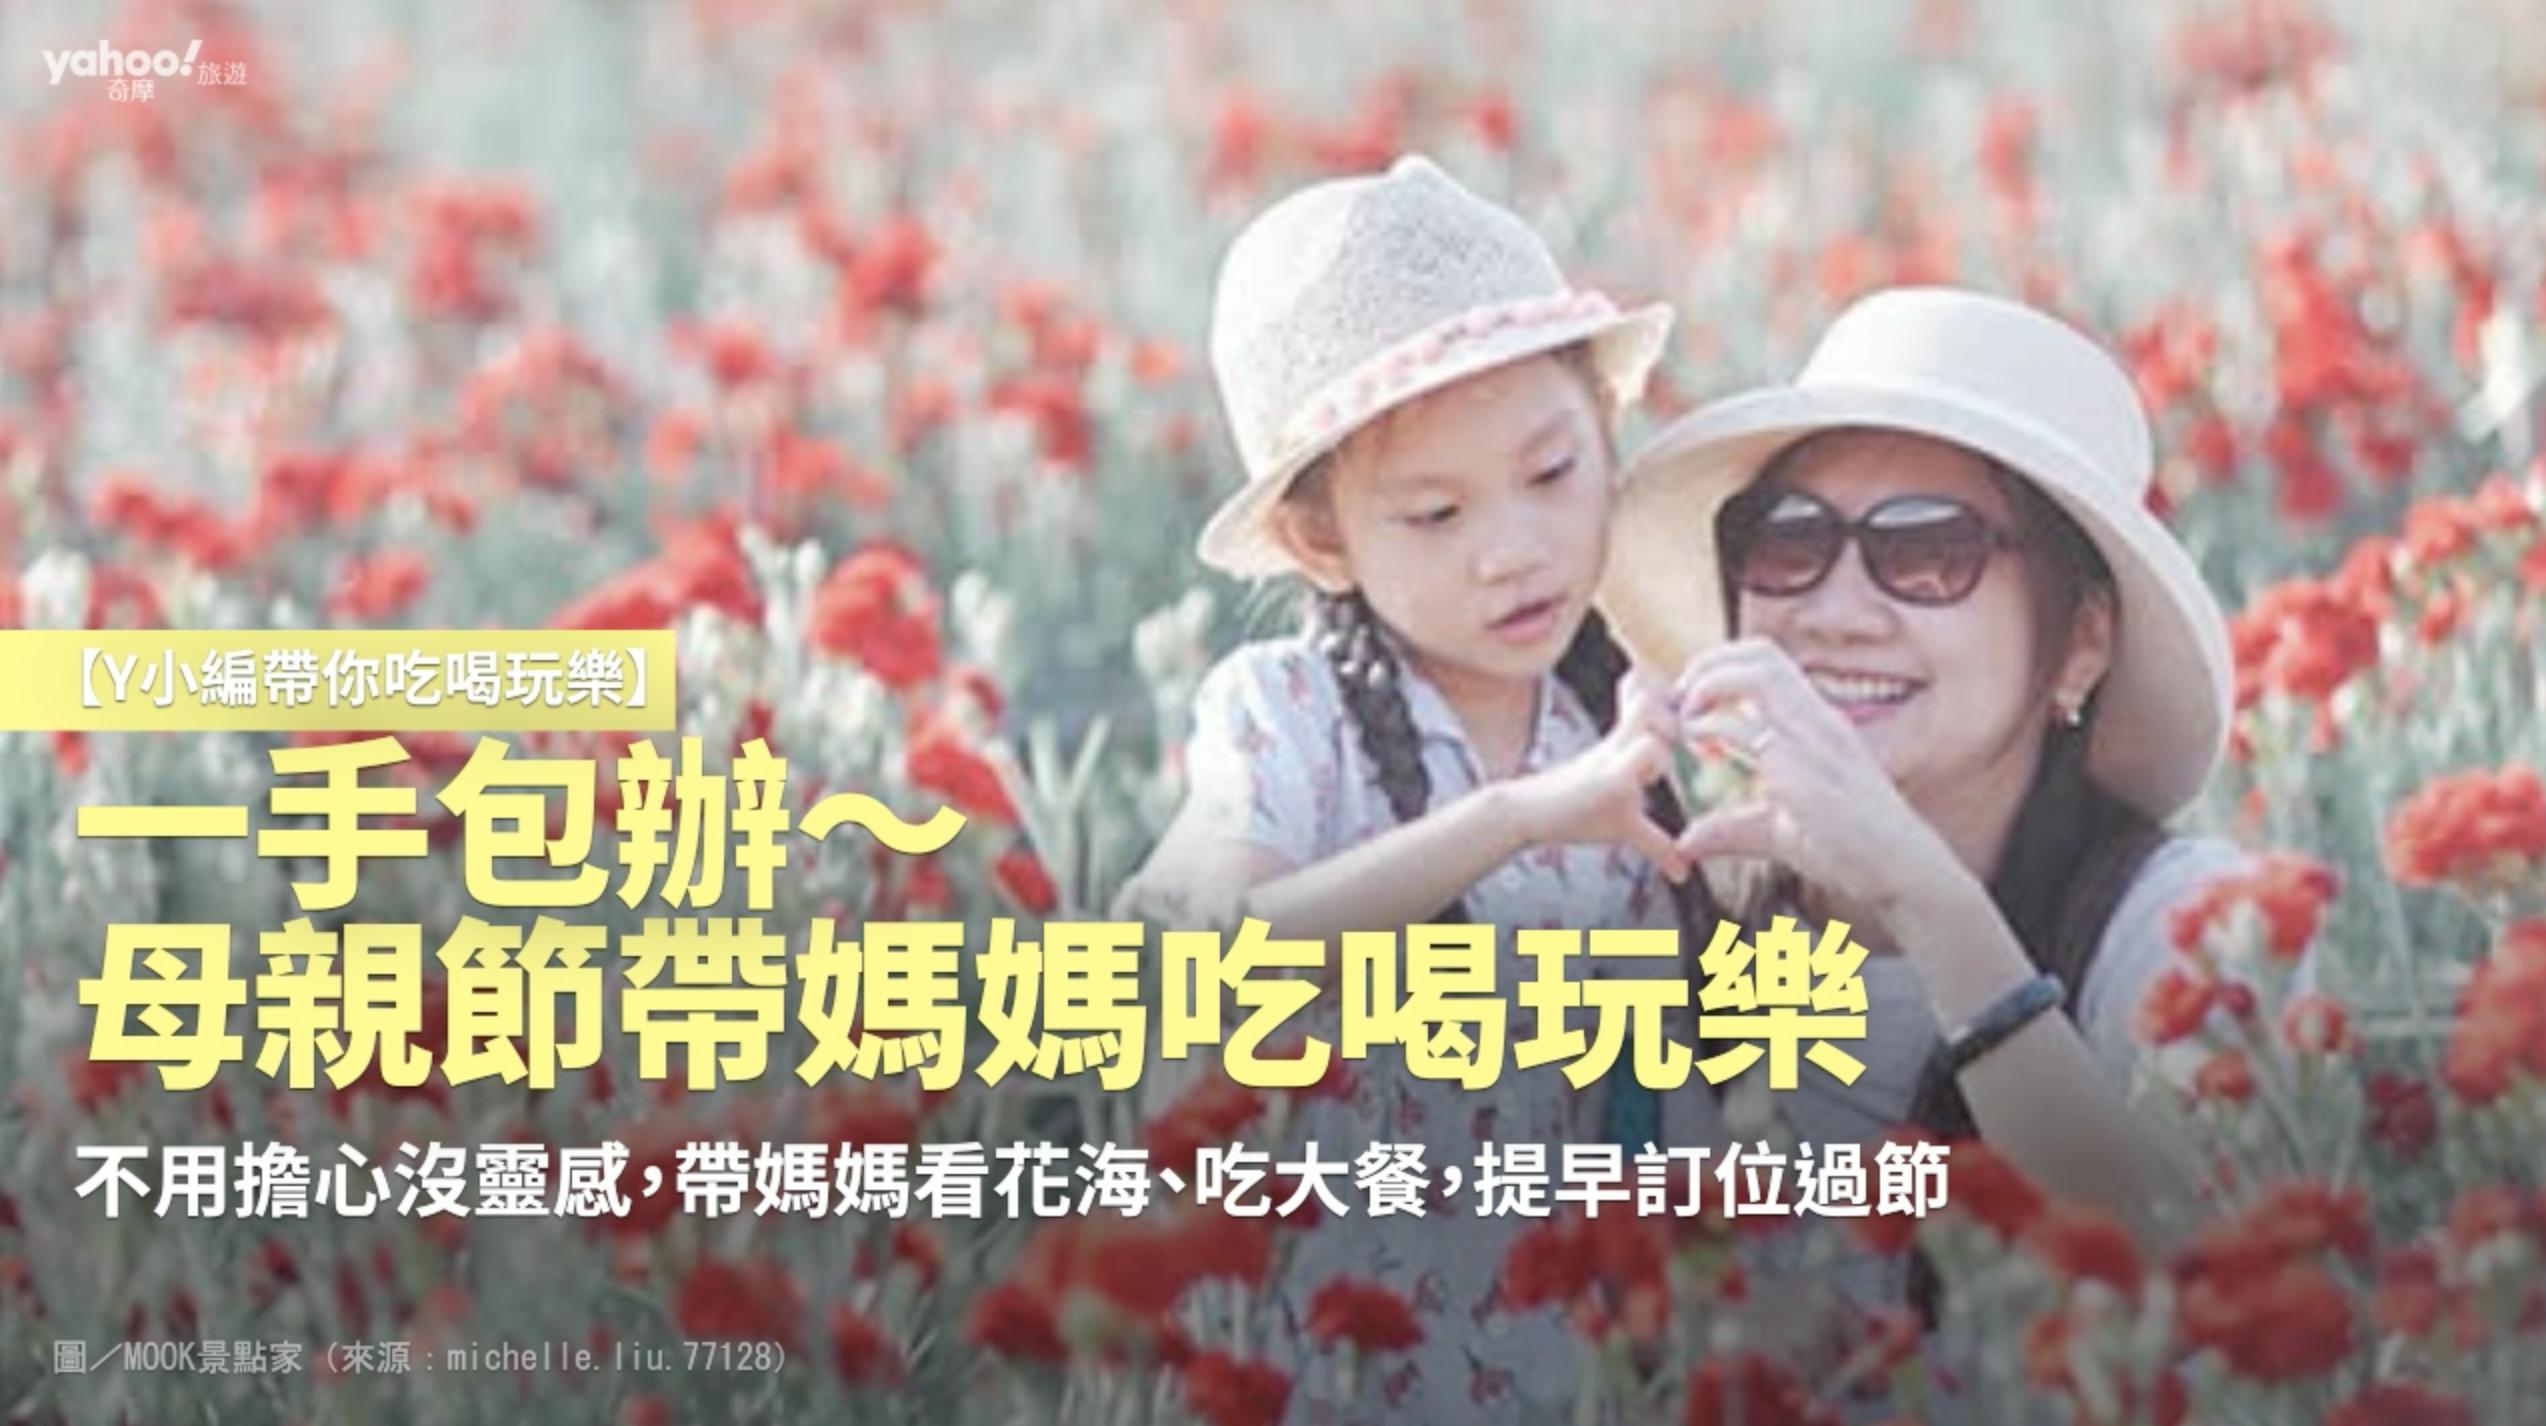 【Y小編帶你吃喝玩樂】一手包辦~母親節帶媽媽吃喝玩樂